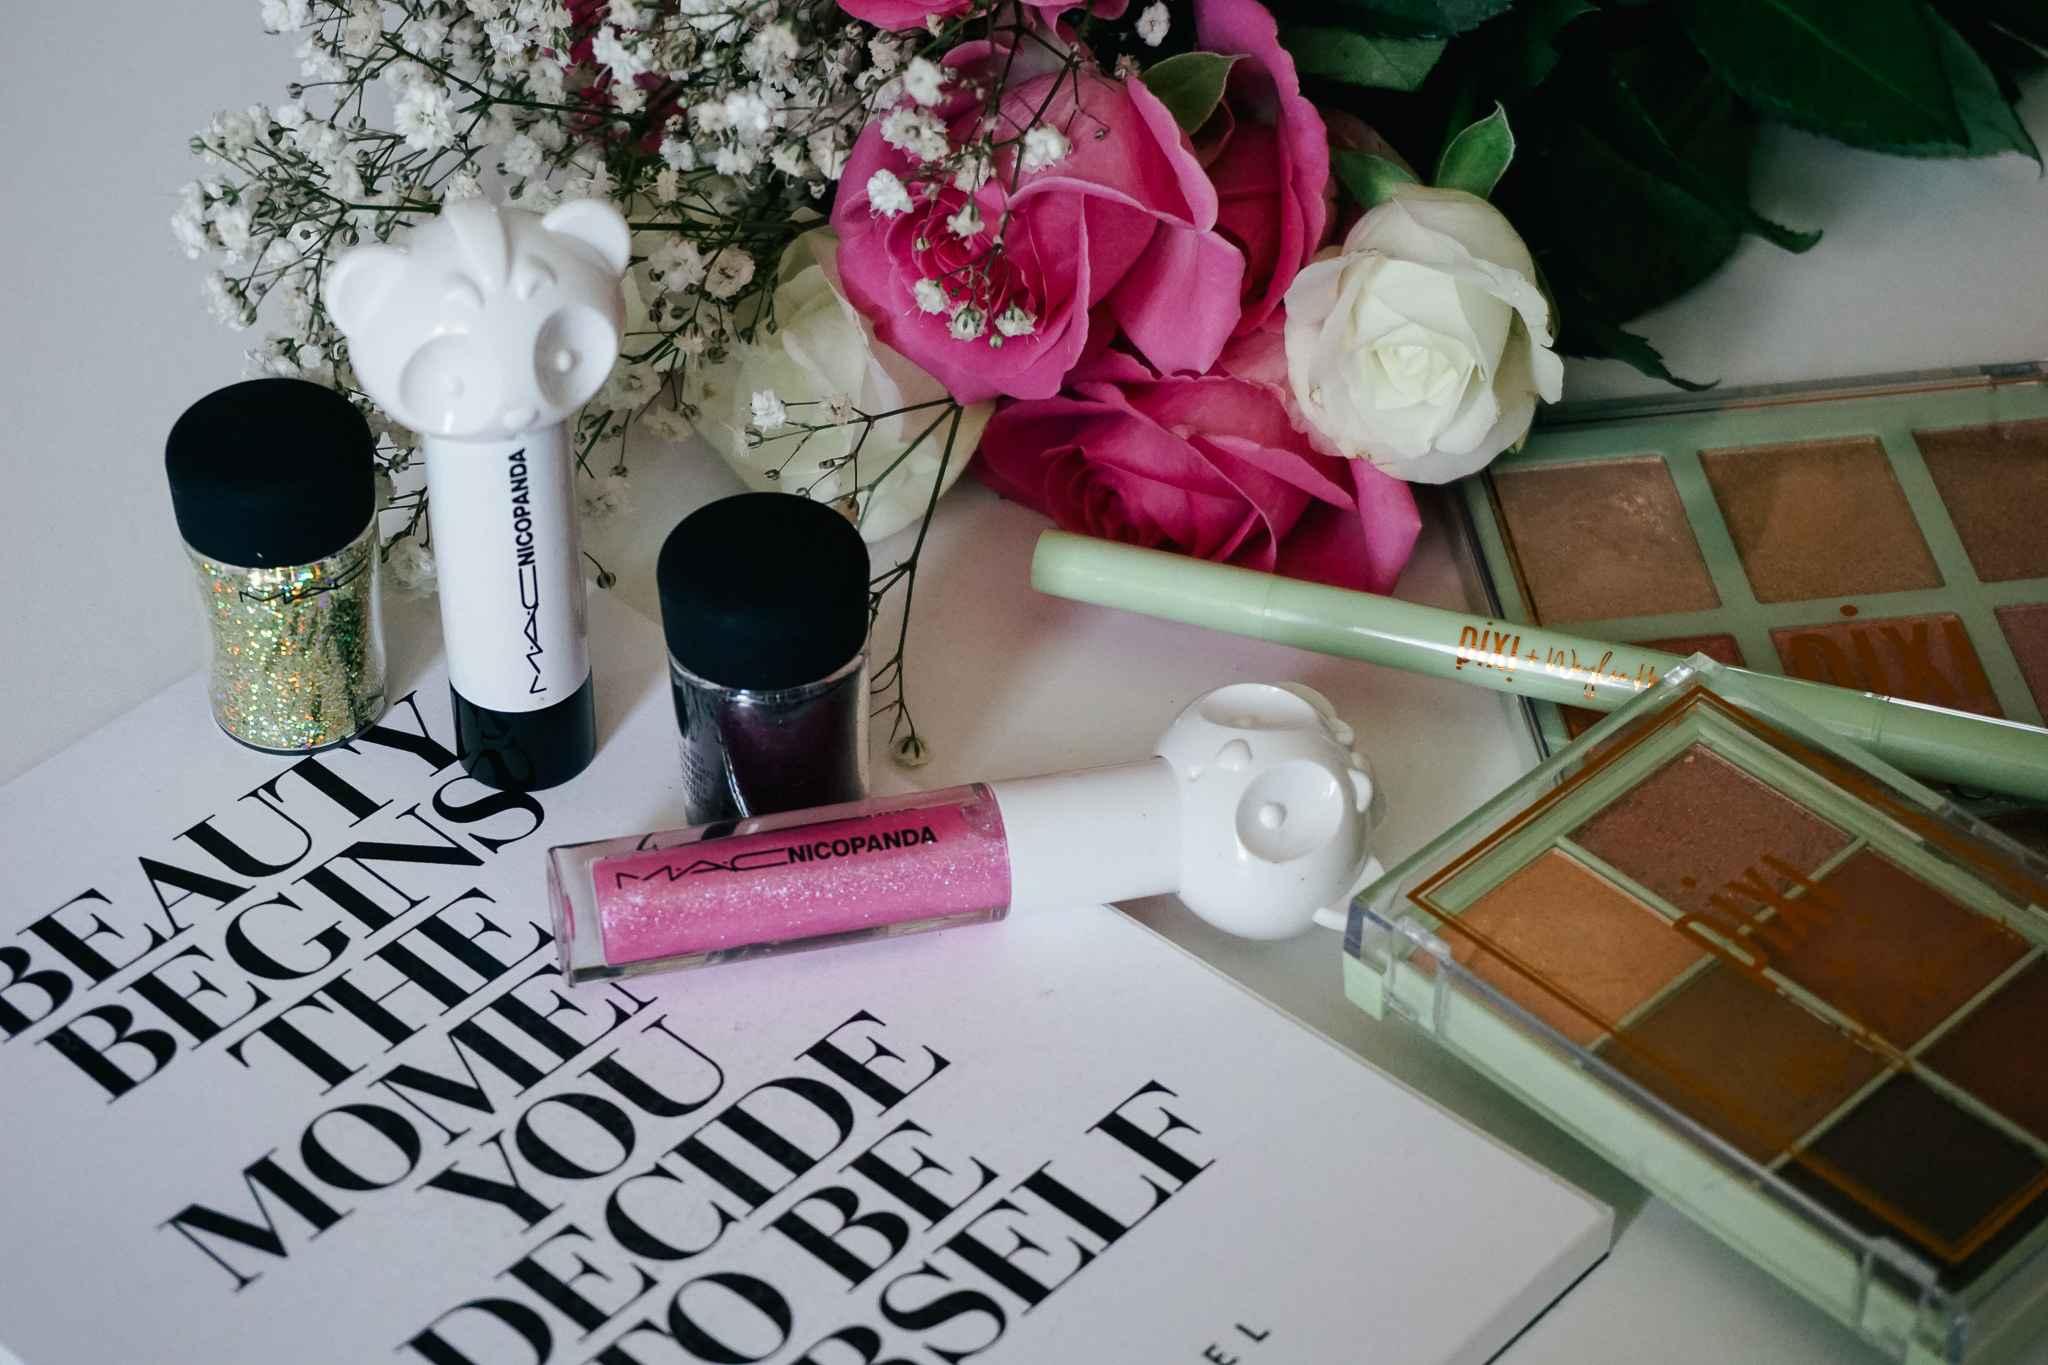 Pixi Beauty Mac Cosmetics